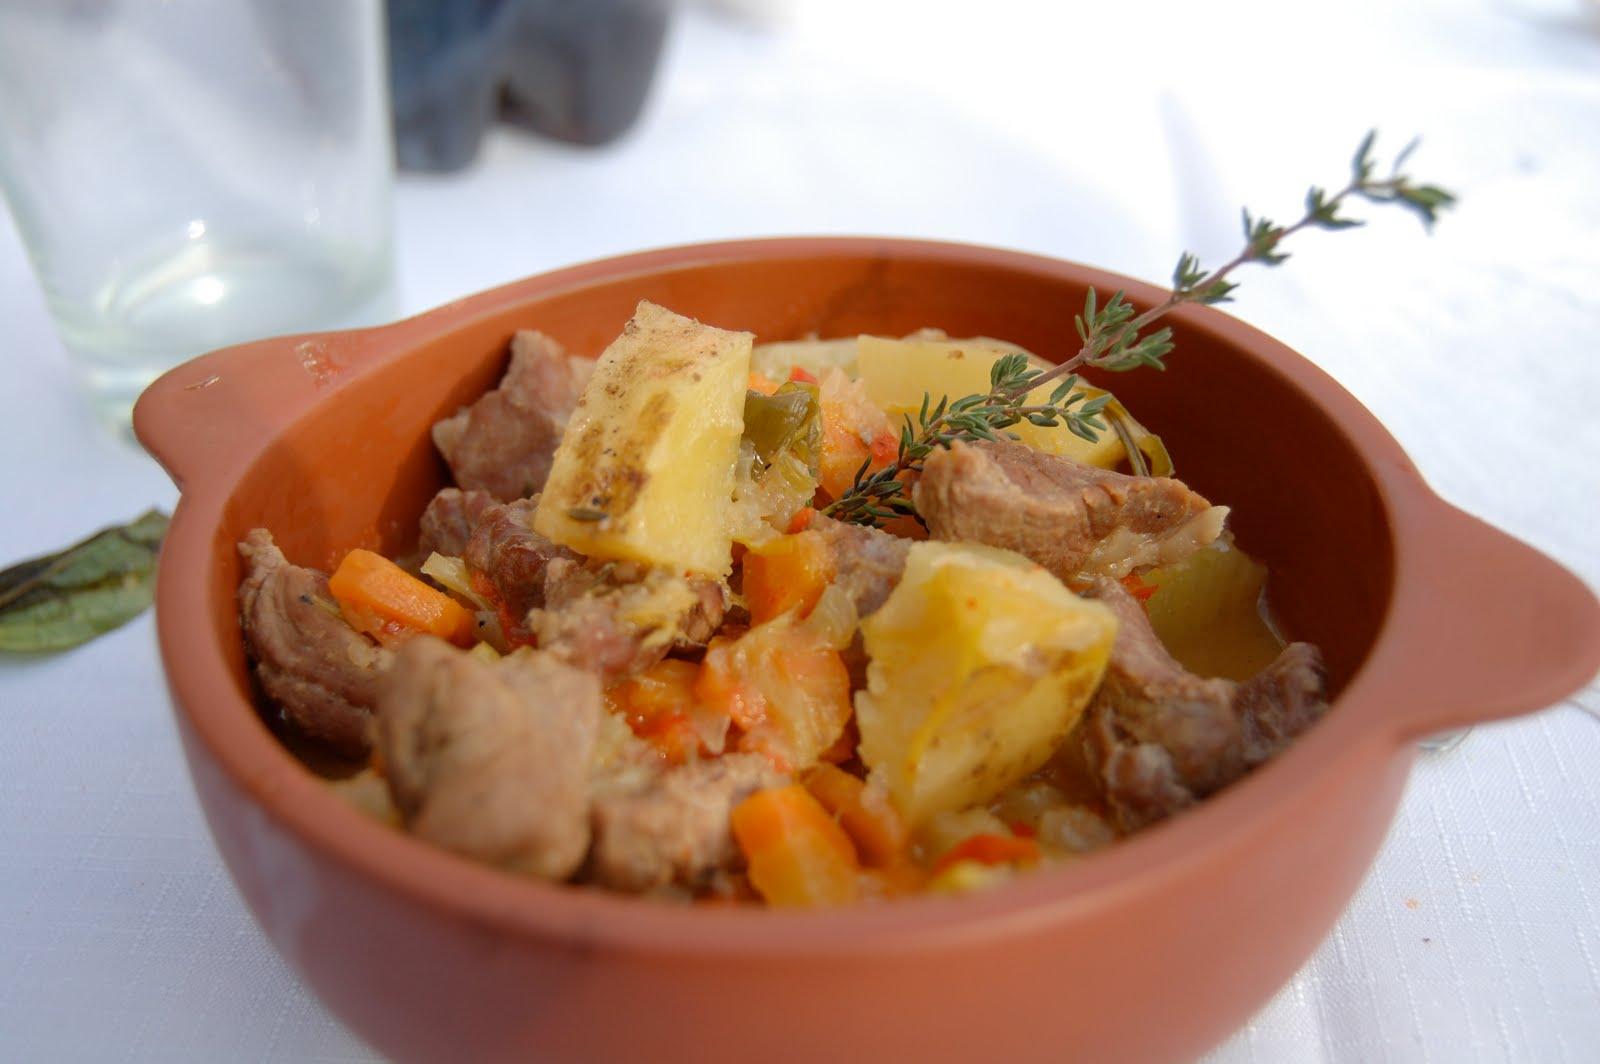 Cara in argentina again la cocina argentina for Cocina argentina